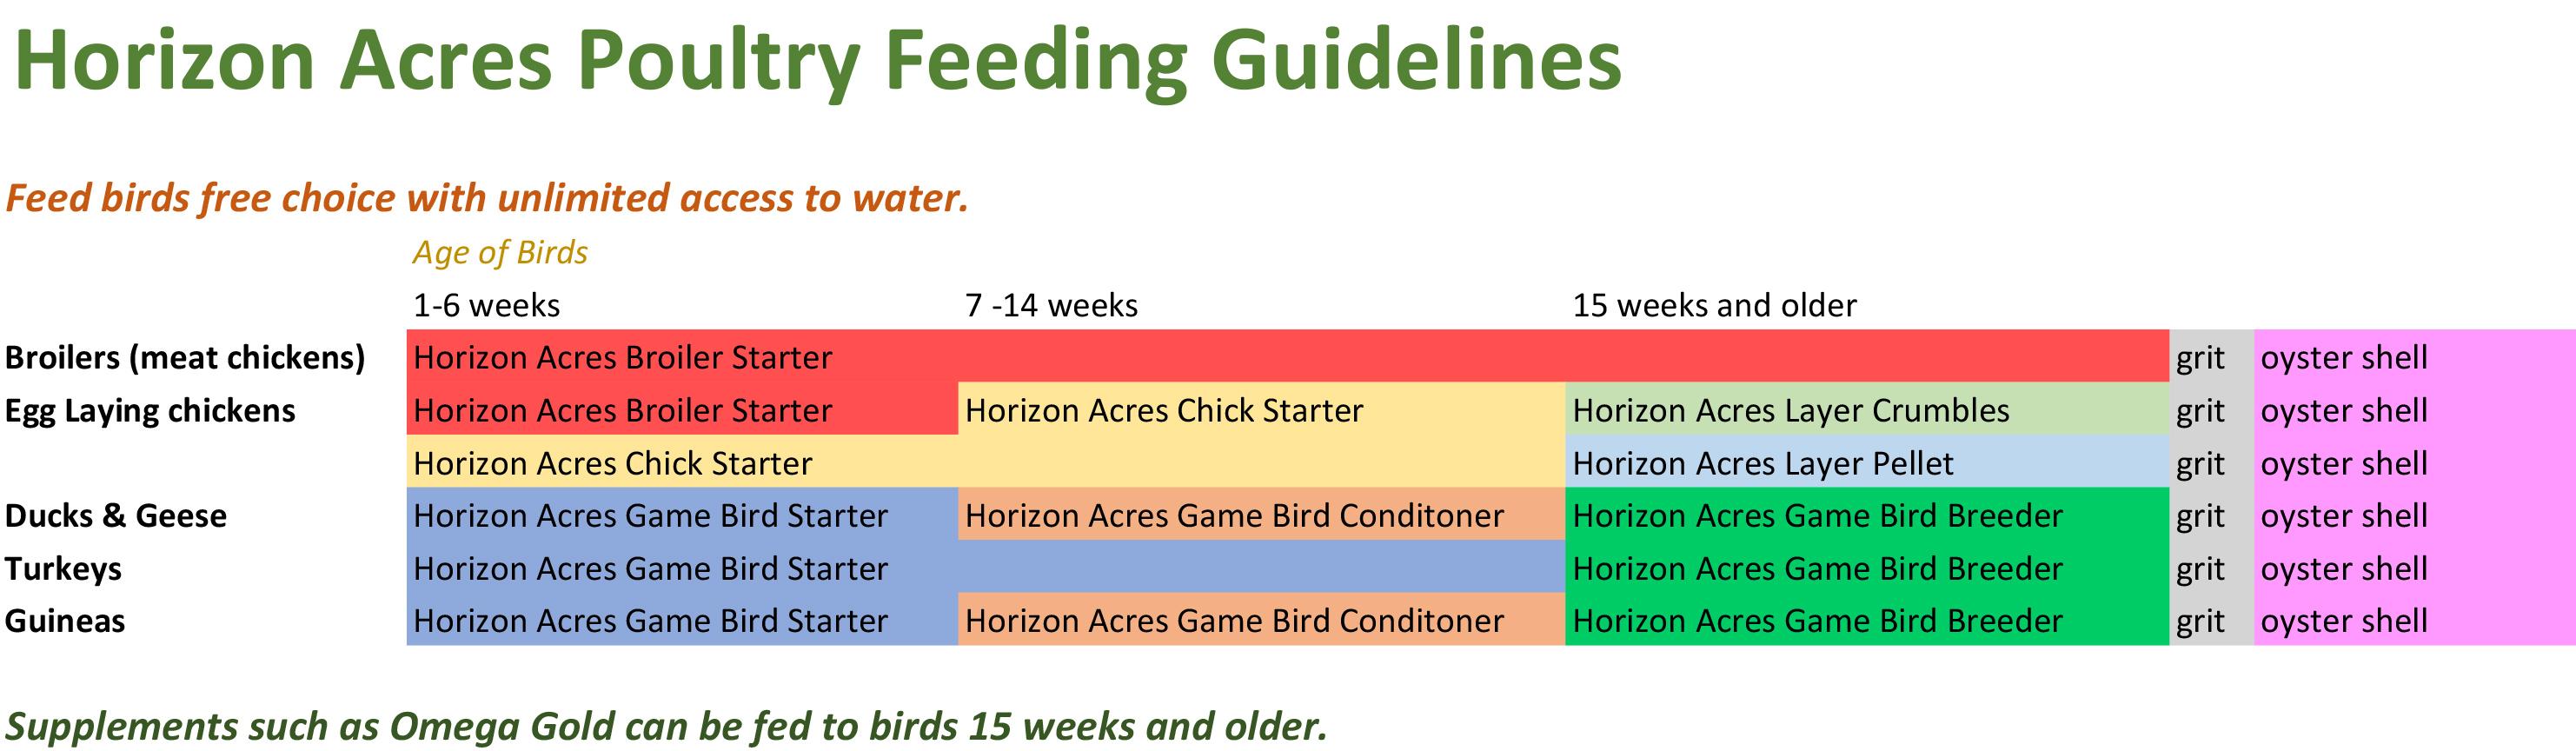 Care Guide | Horizon Acres